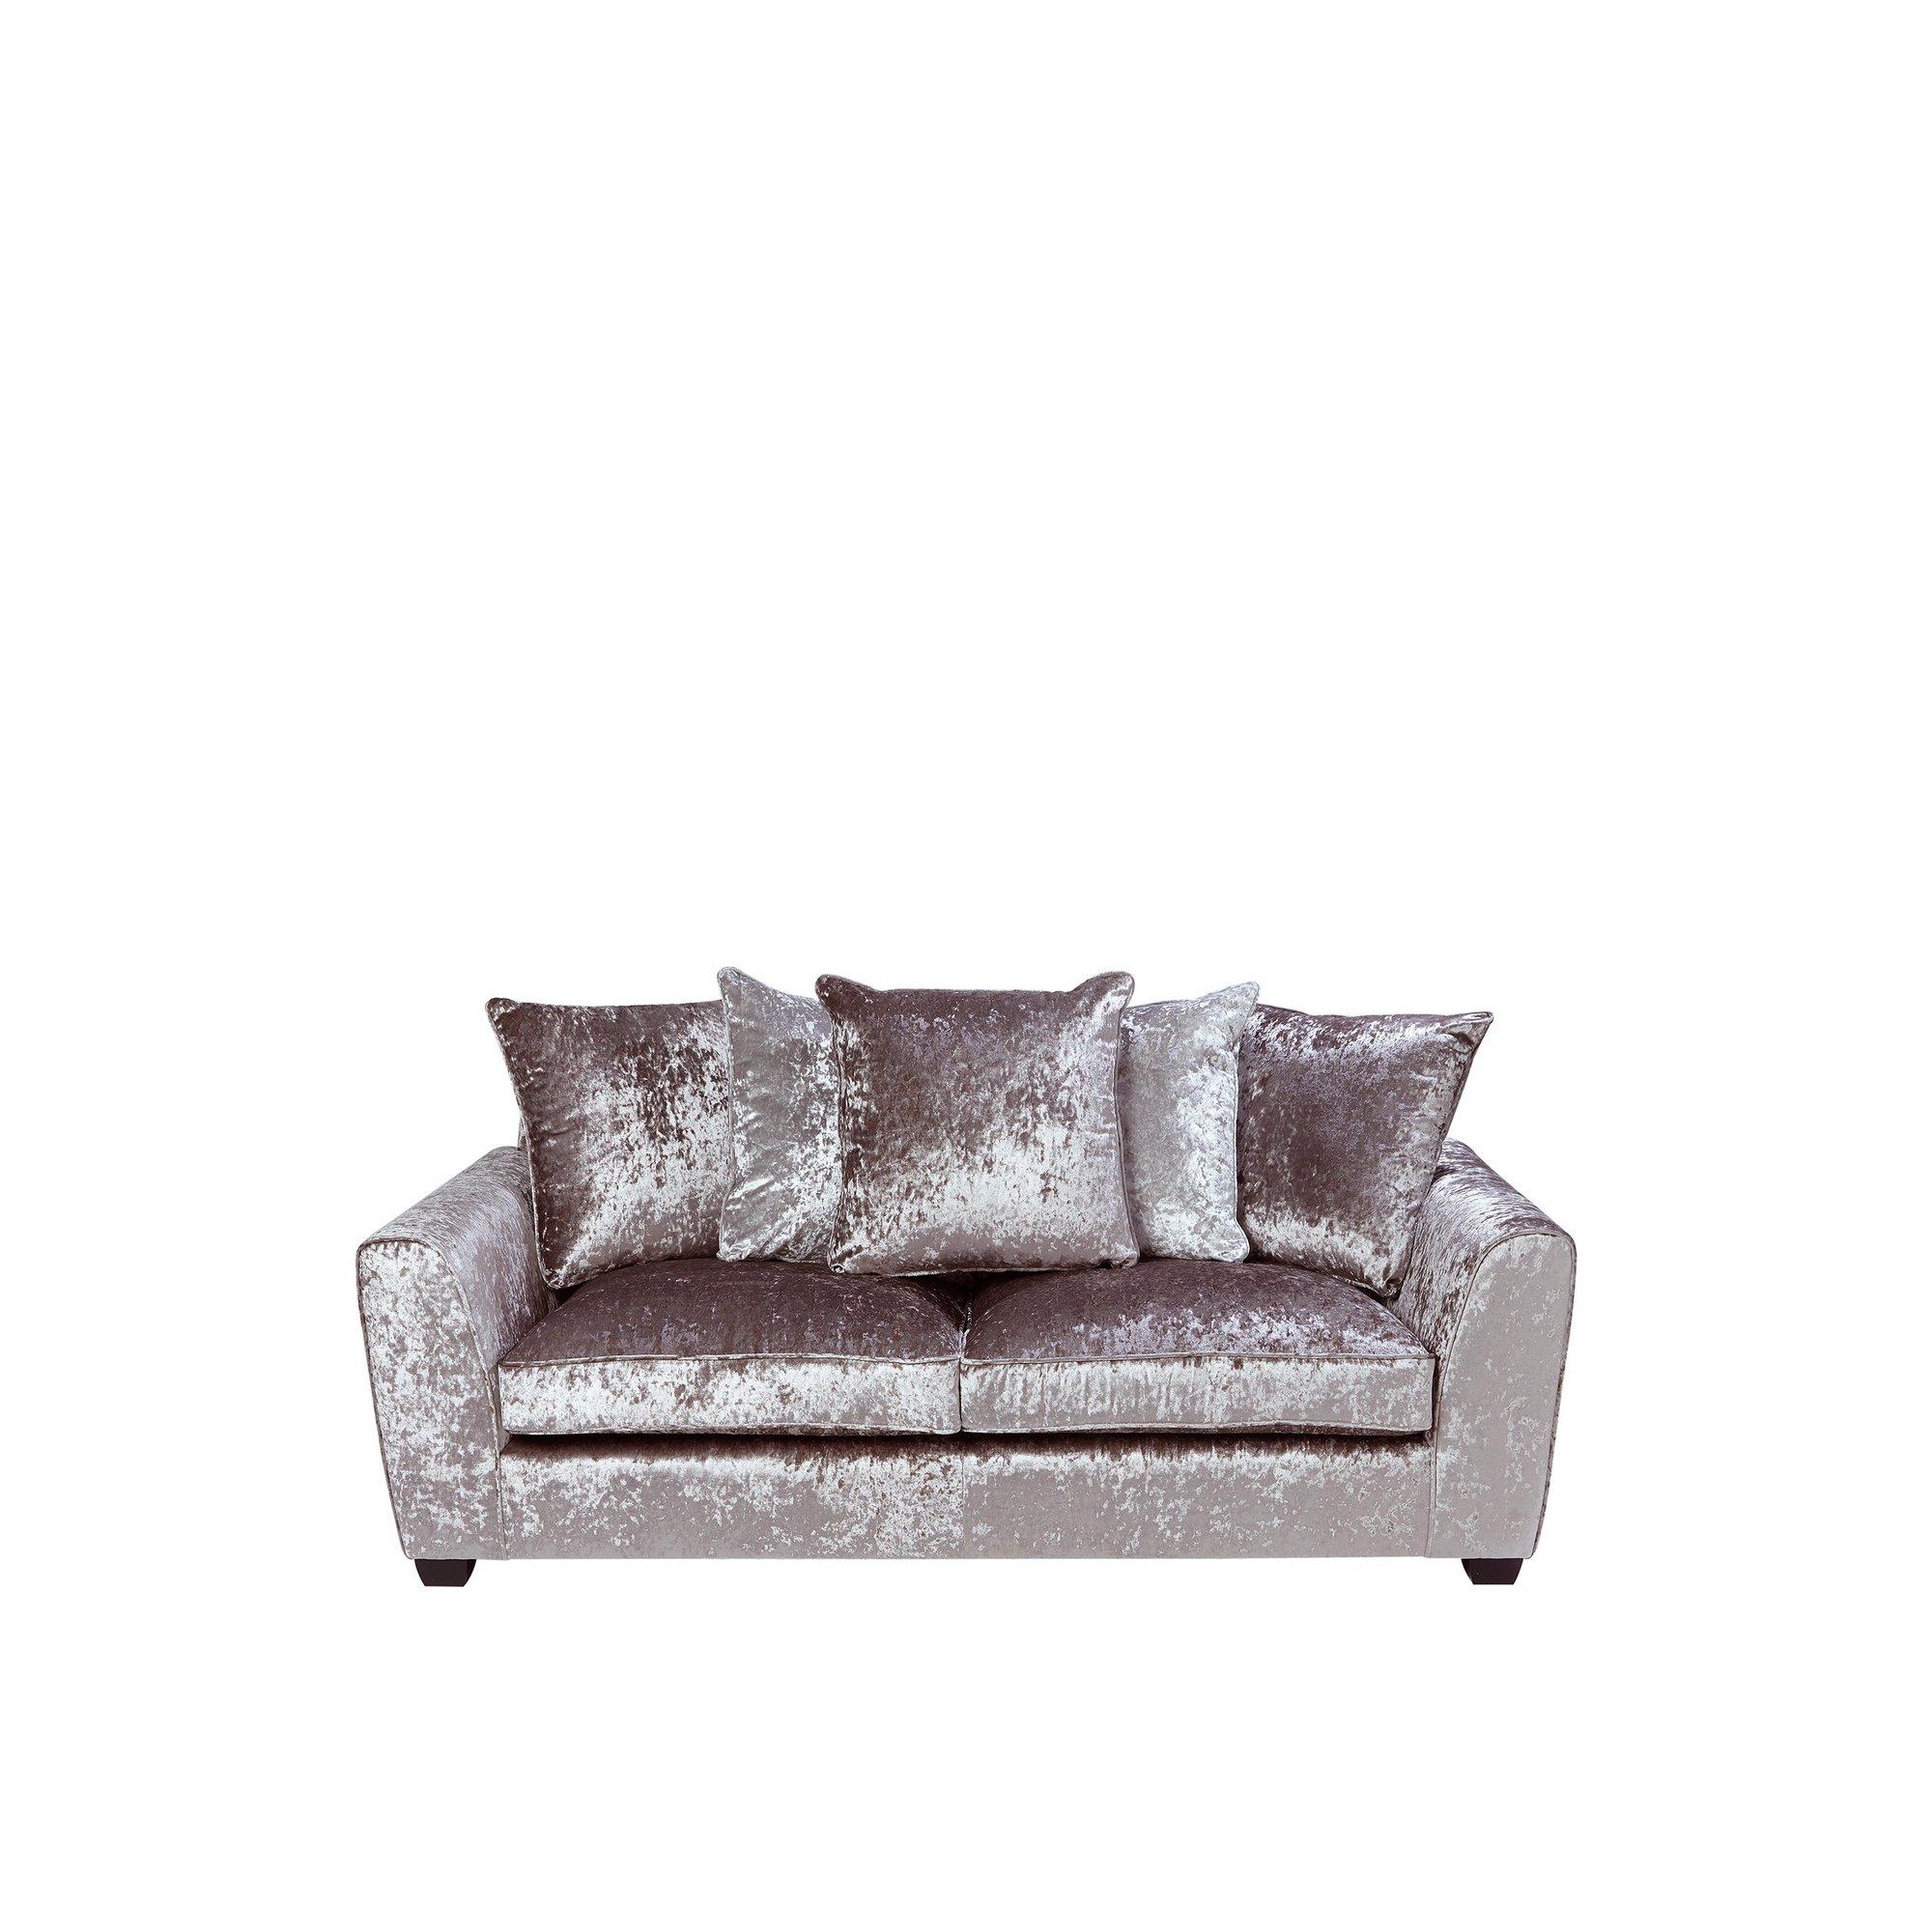 Image of Akira 3 Seater Sofa